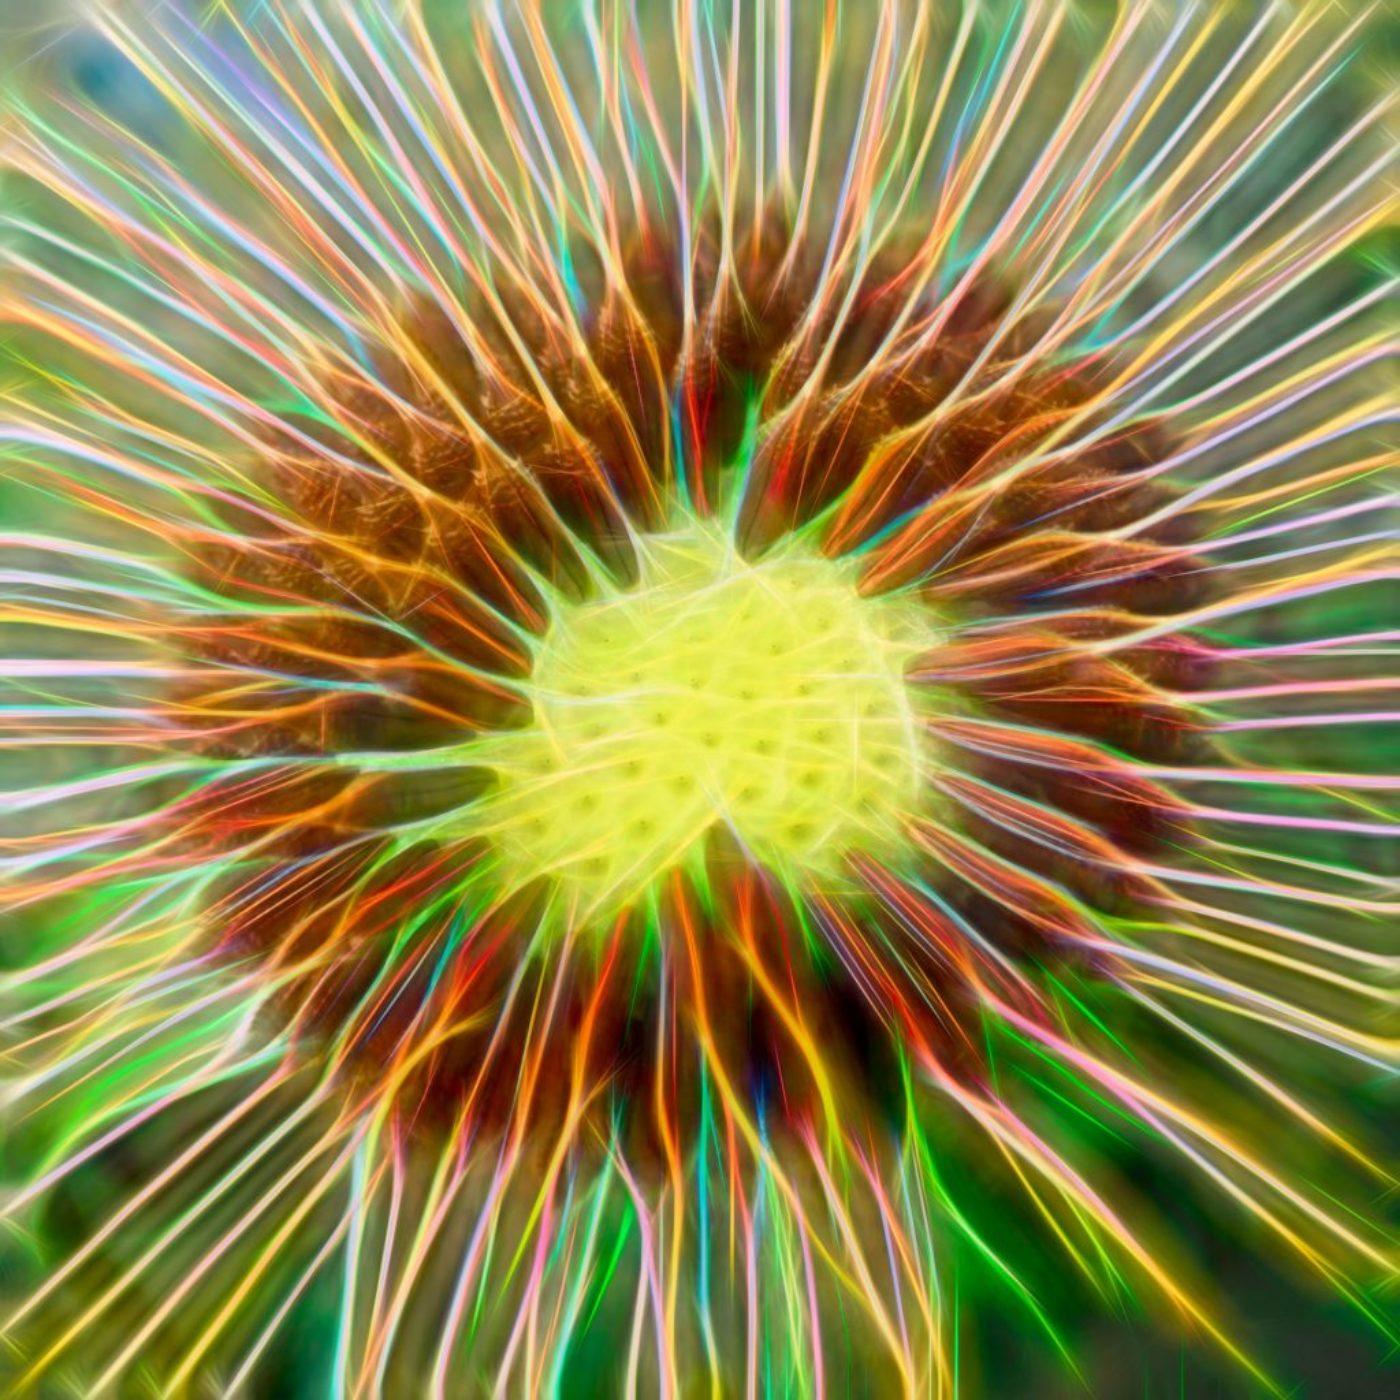 nature. electrified. - flora - Löwenzahn - Taraxacum sect. Ruderalia - Dandelion - 蒲公英